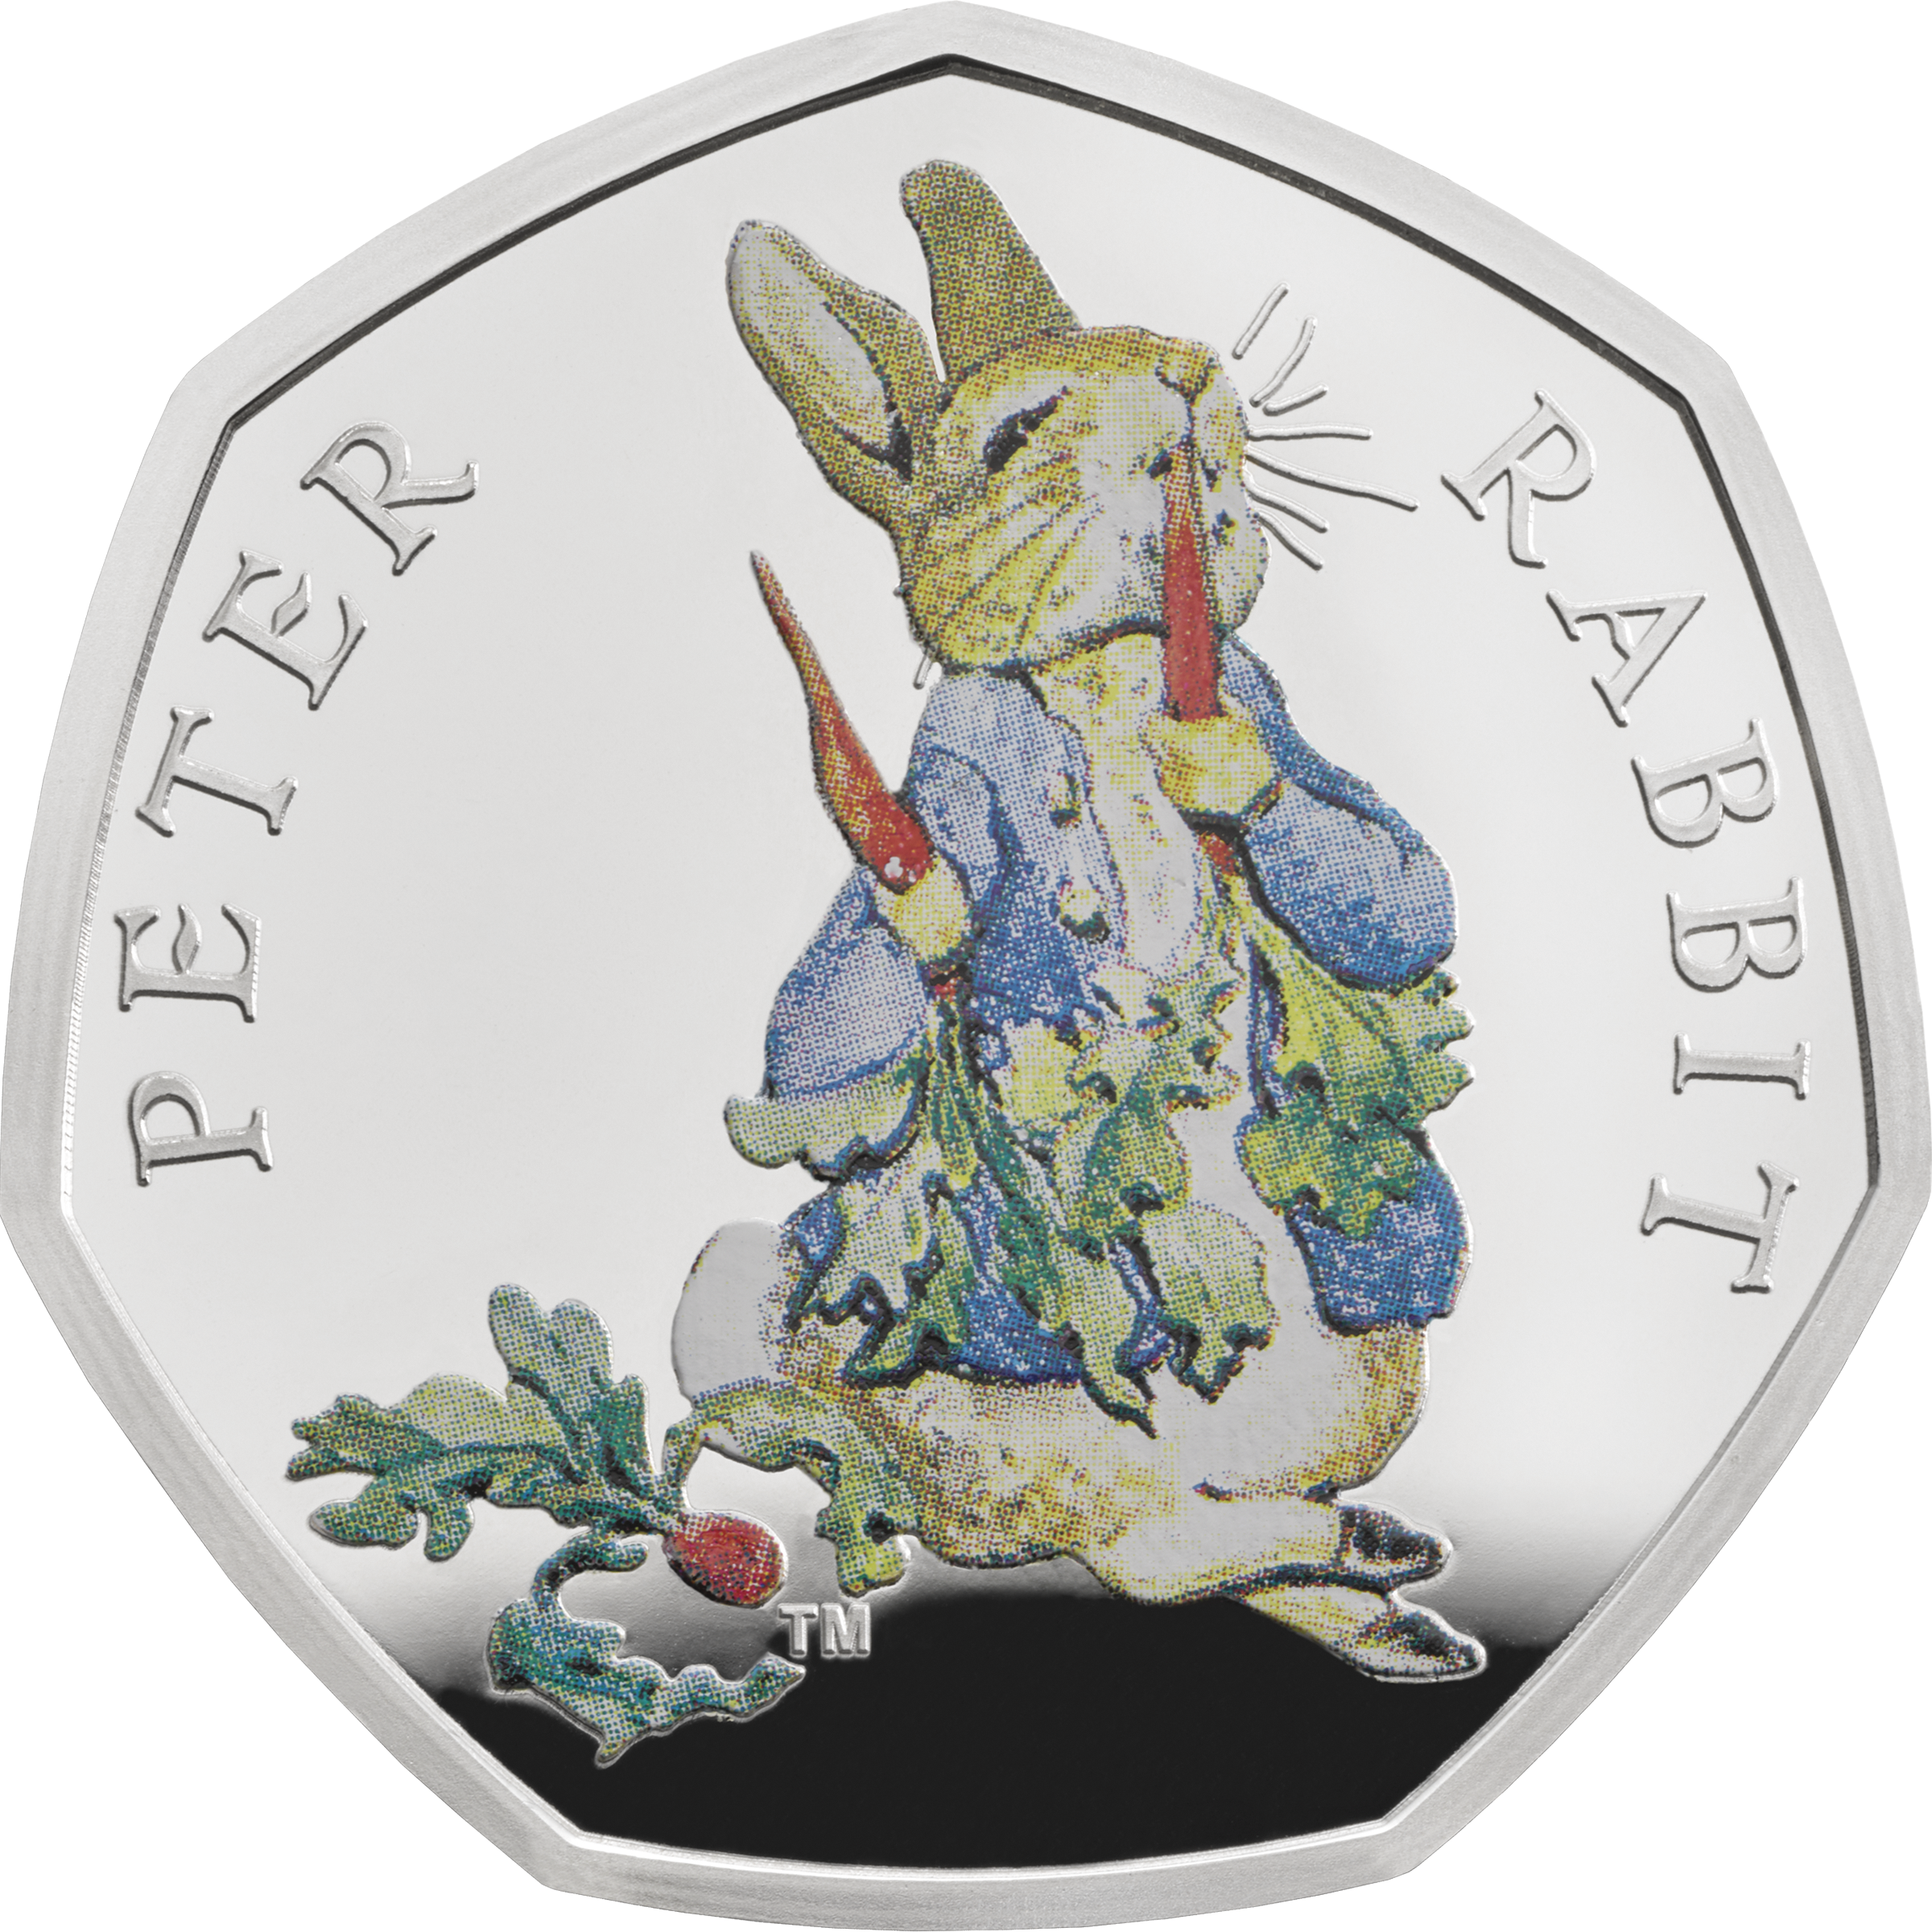 Peter Rabbit 2018 UK 50p Silver Proof Coin rev tone - ukp52894.png